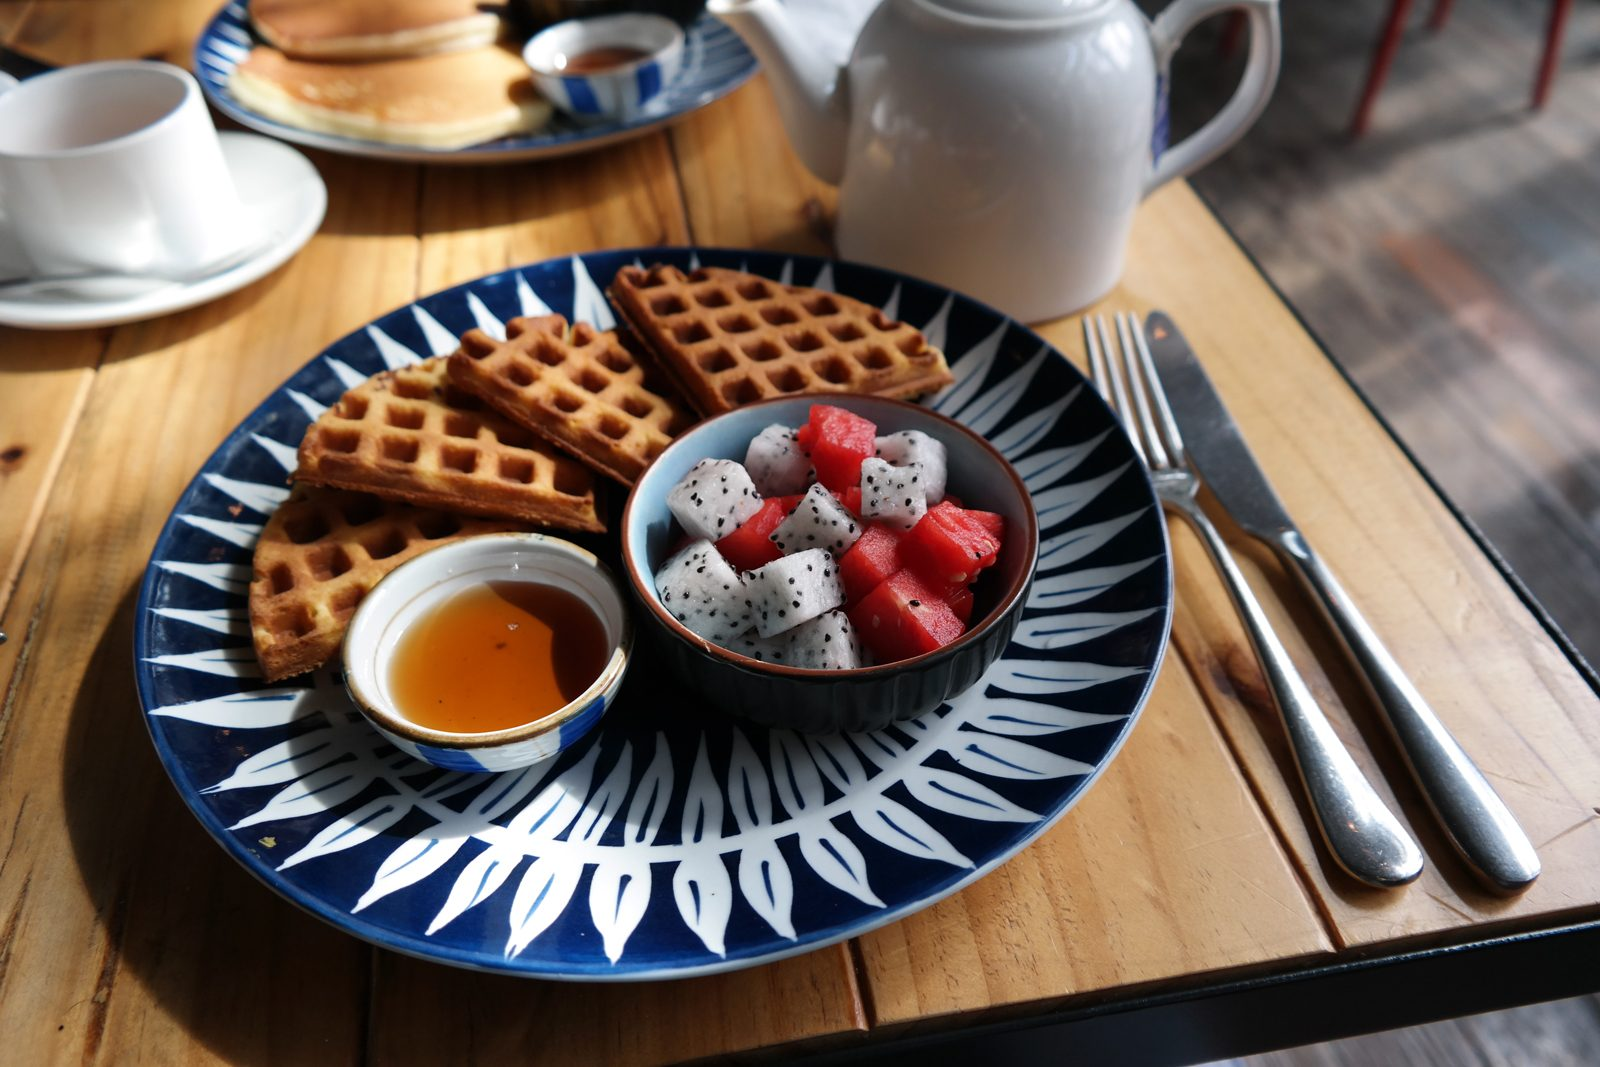 Waffles breakfast Beergrdn restaurant bar design URBN Hotel Shanghai boutique hotel photo usofparis travel blog